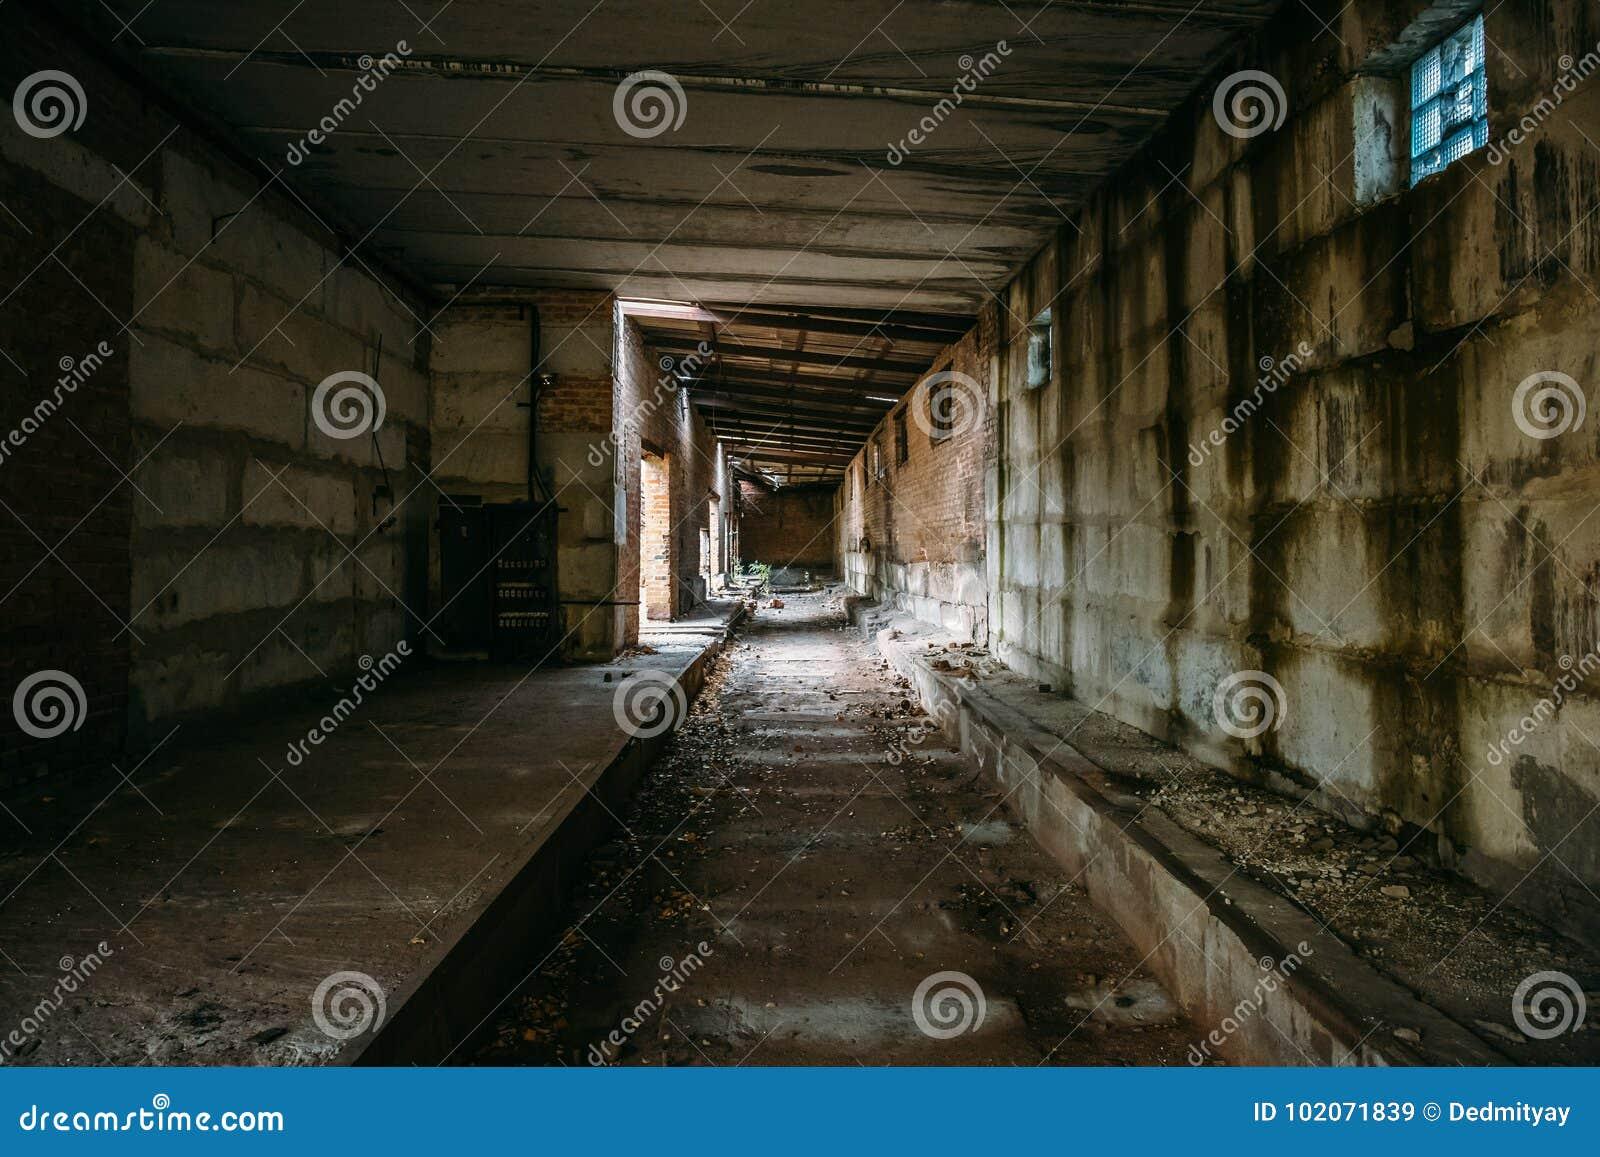 Donkere tunnel in oude verlaten baksteenfabriek Verlaten industriële gang